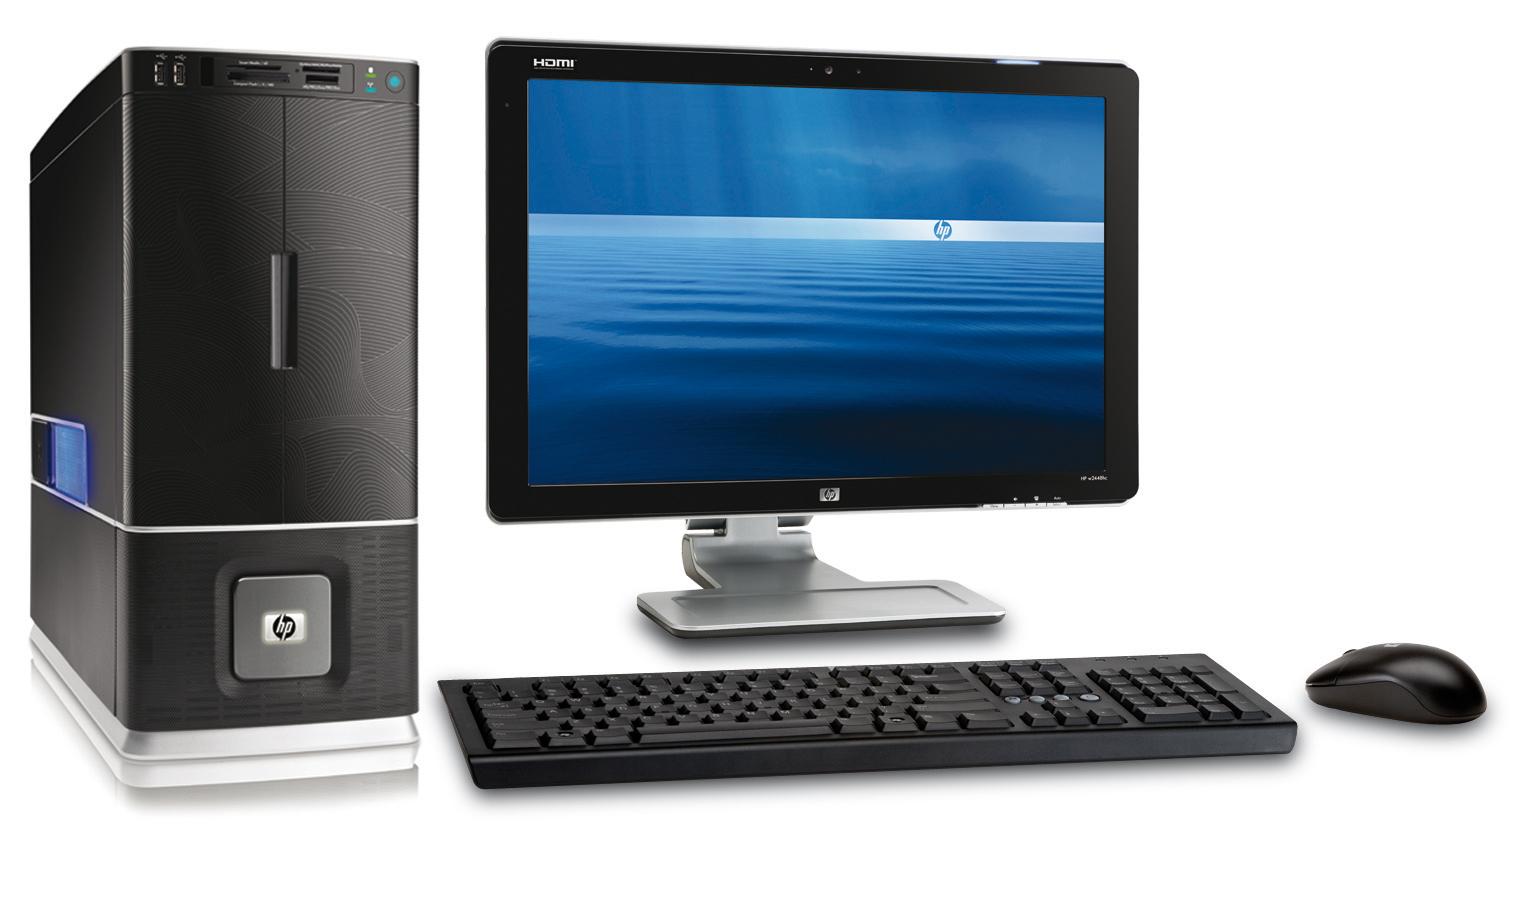 PC_2010s